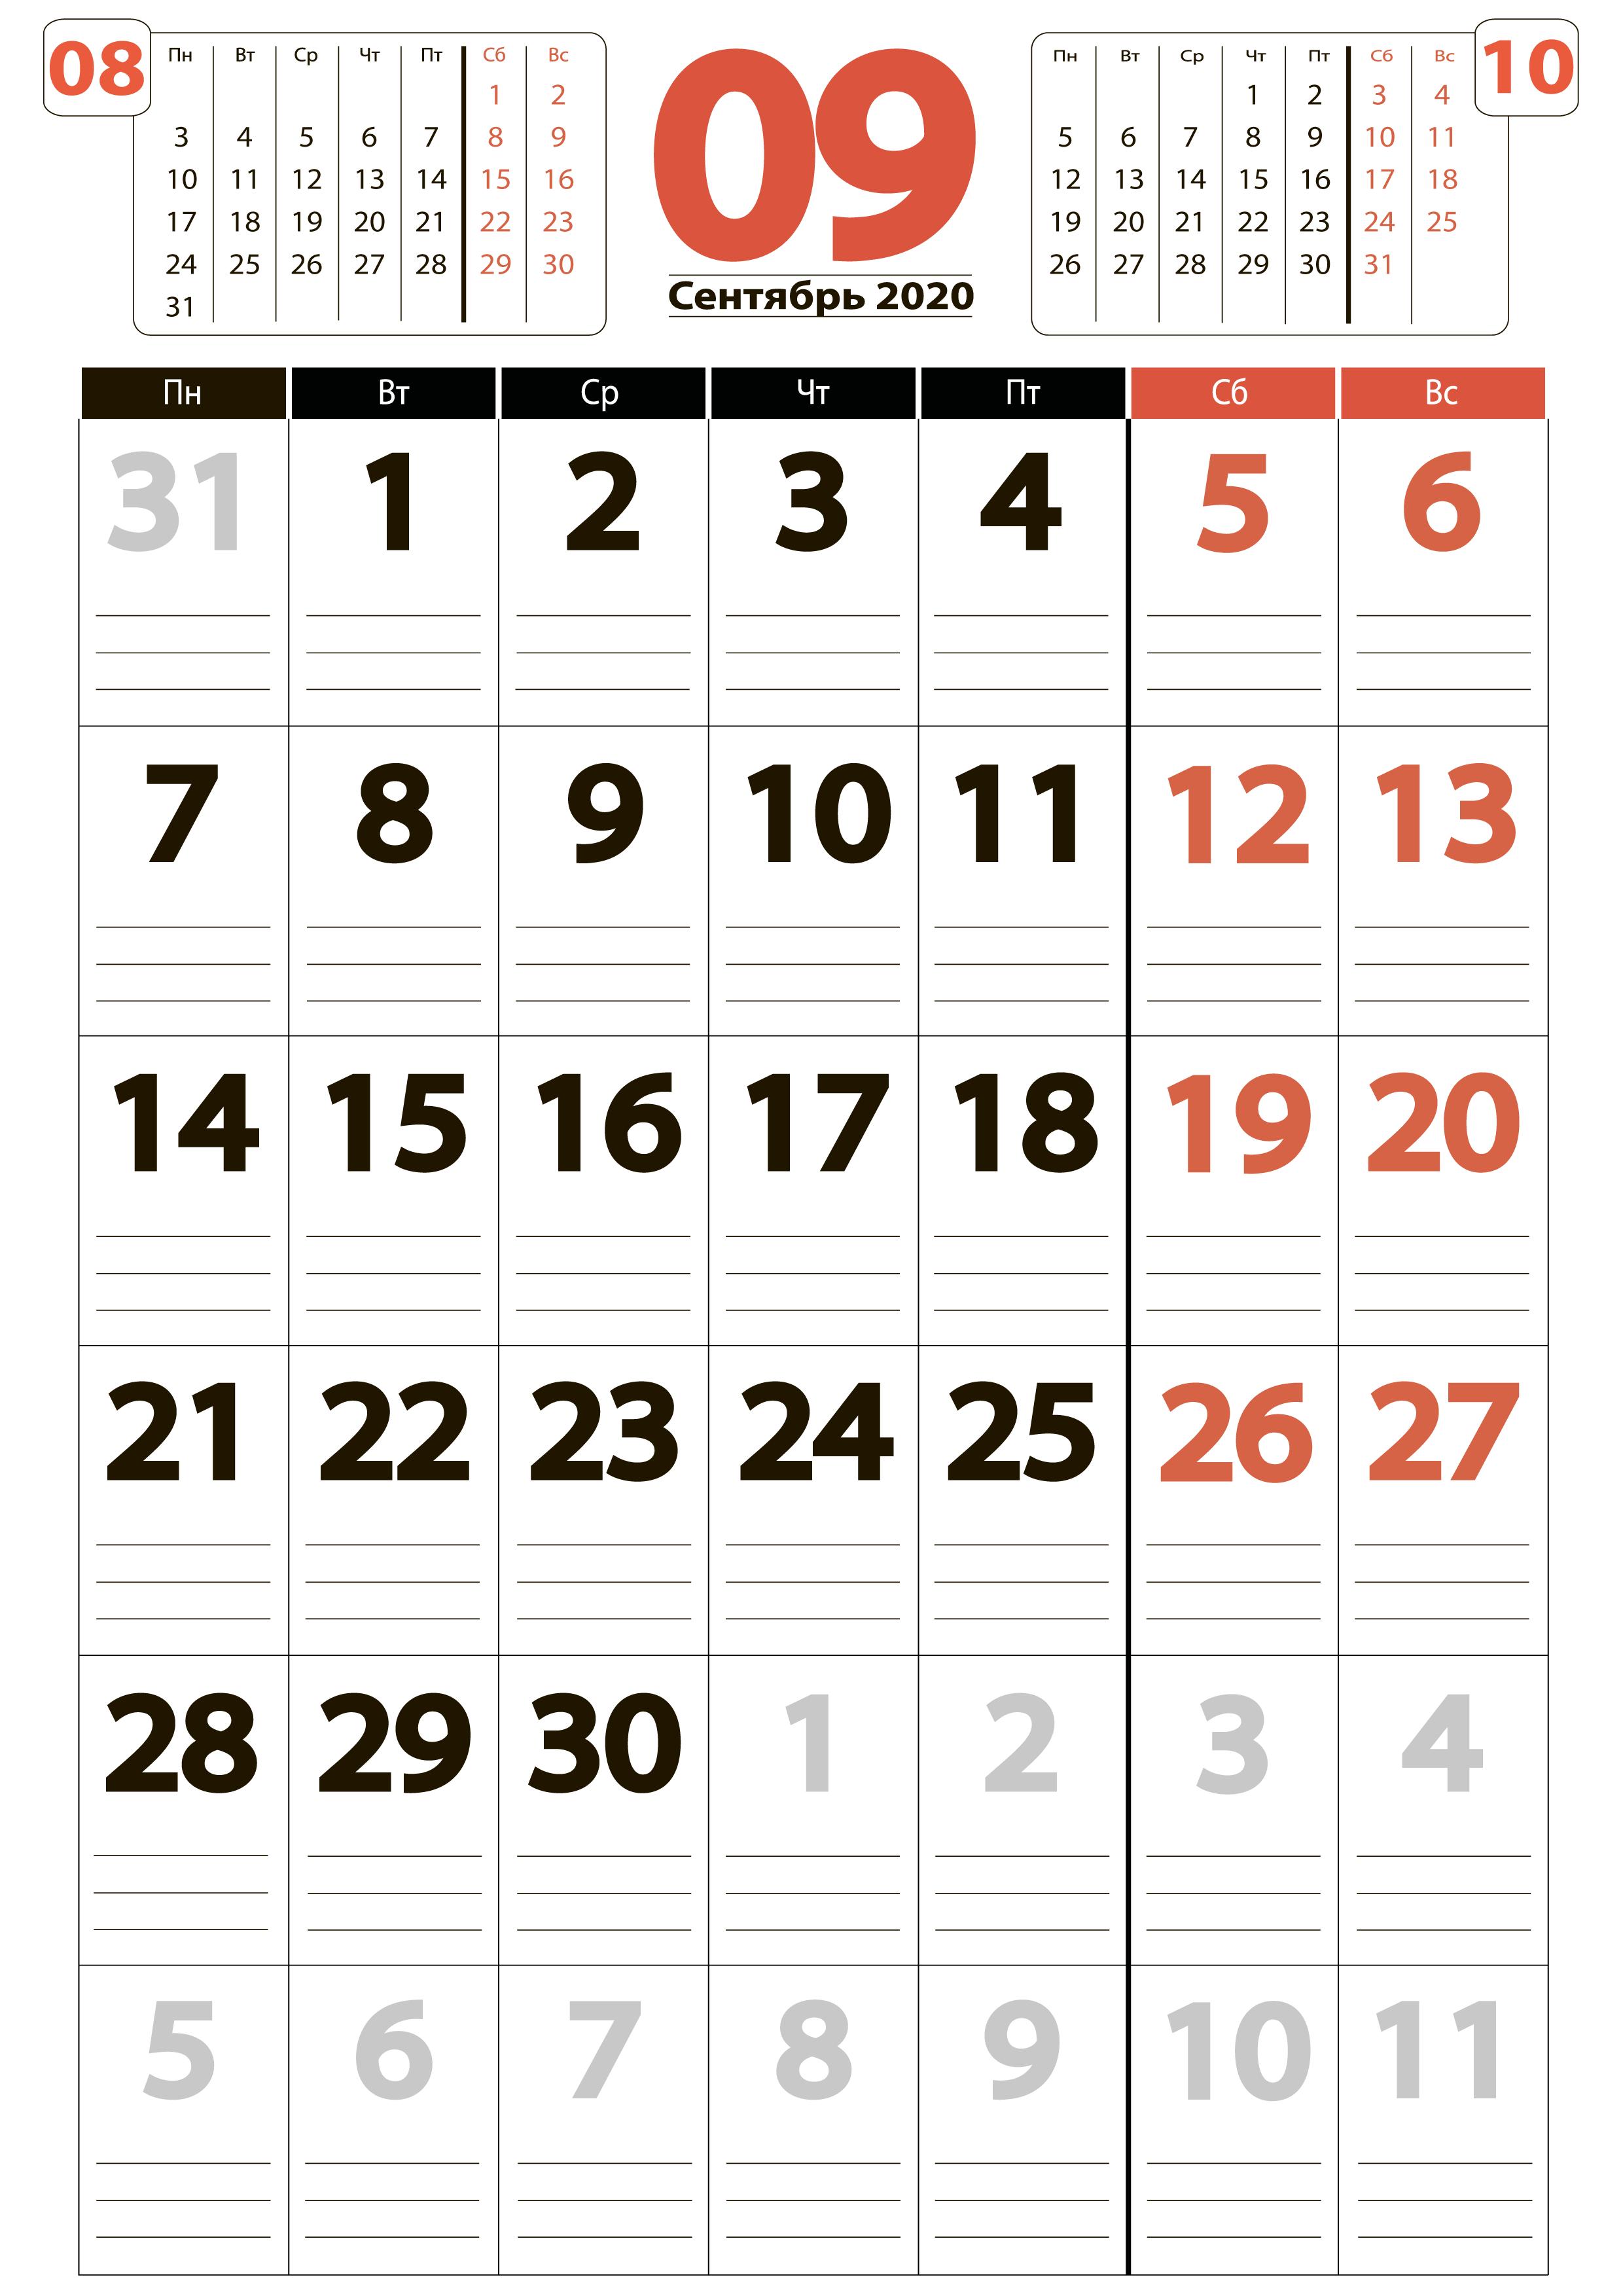 Сентябрь 2020 - Крупный календарь на месяц